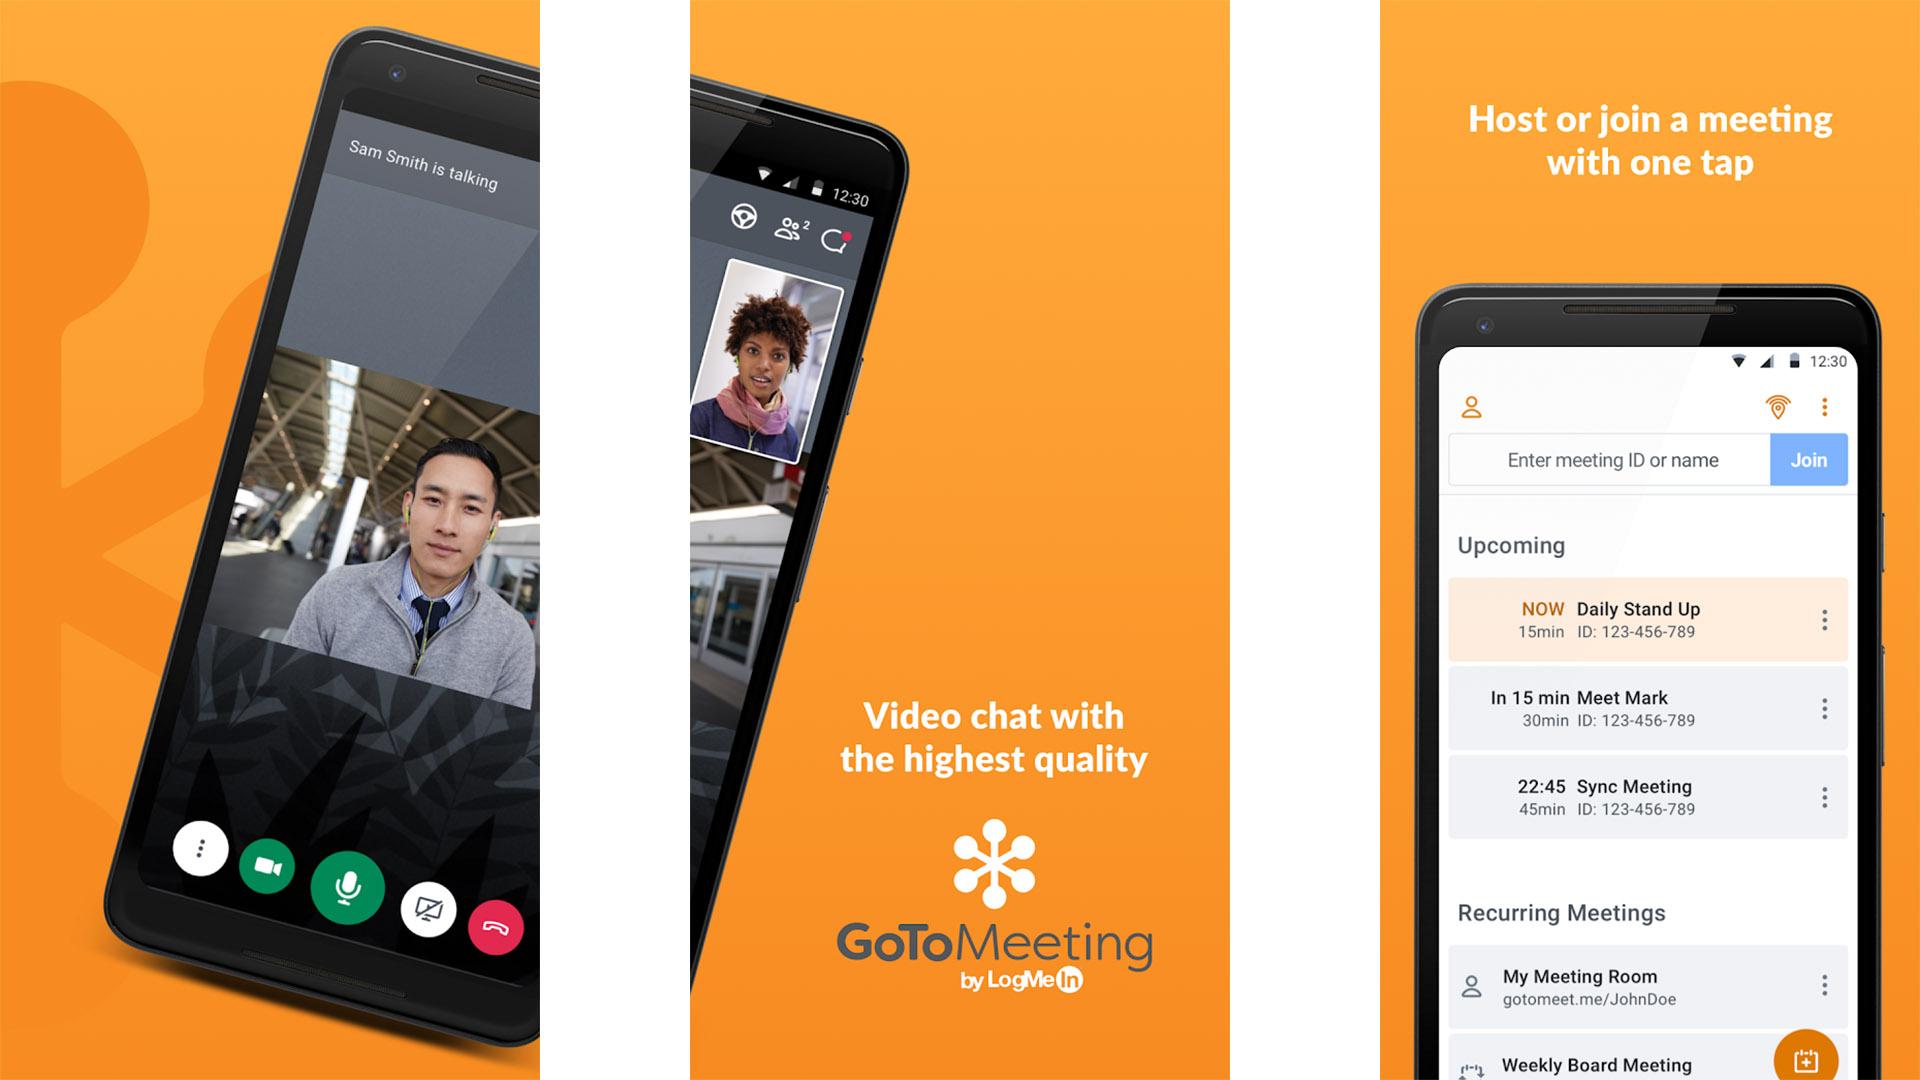 GoToMeeting screenshot 2020